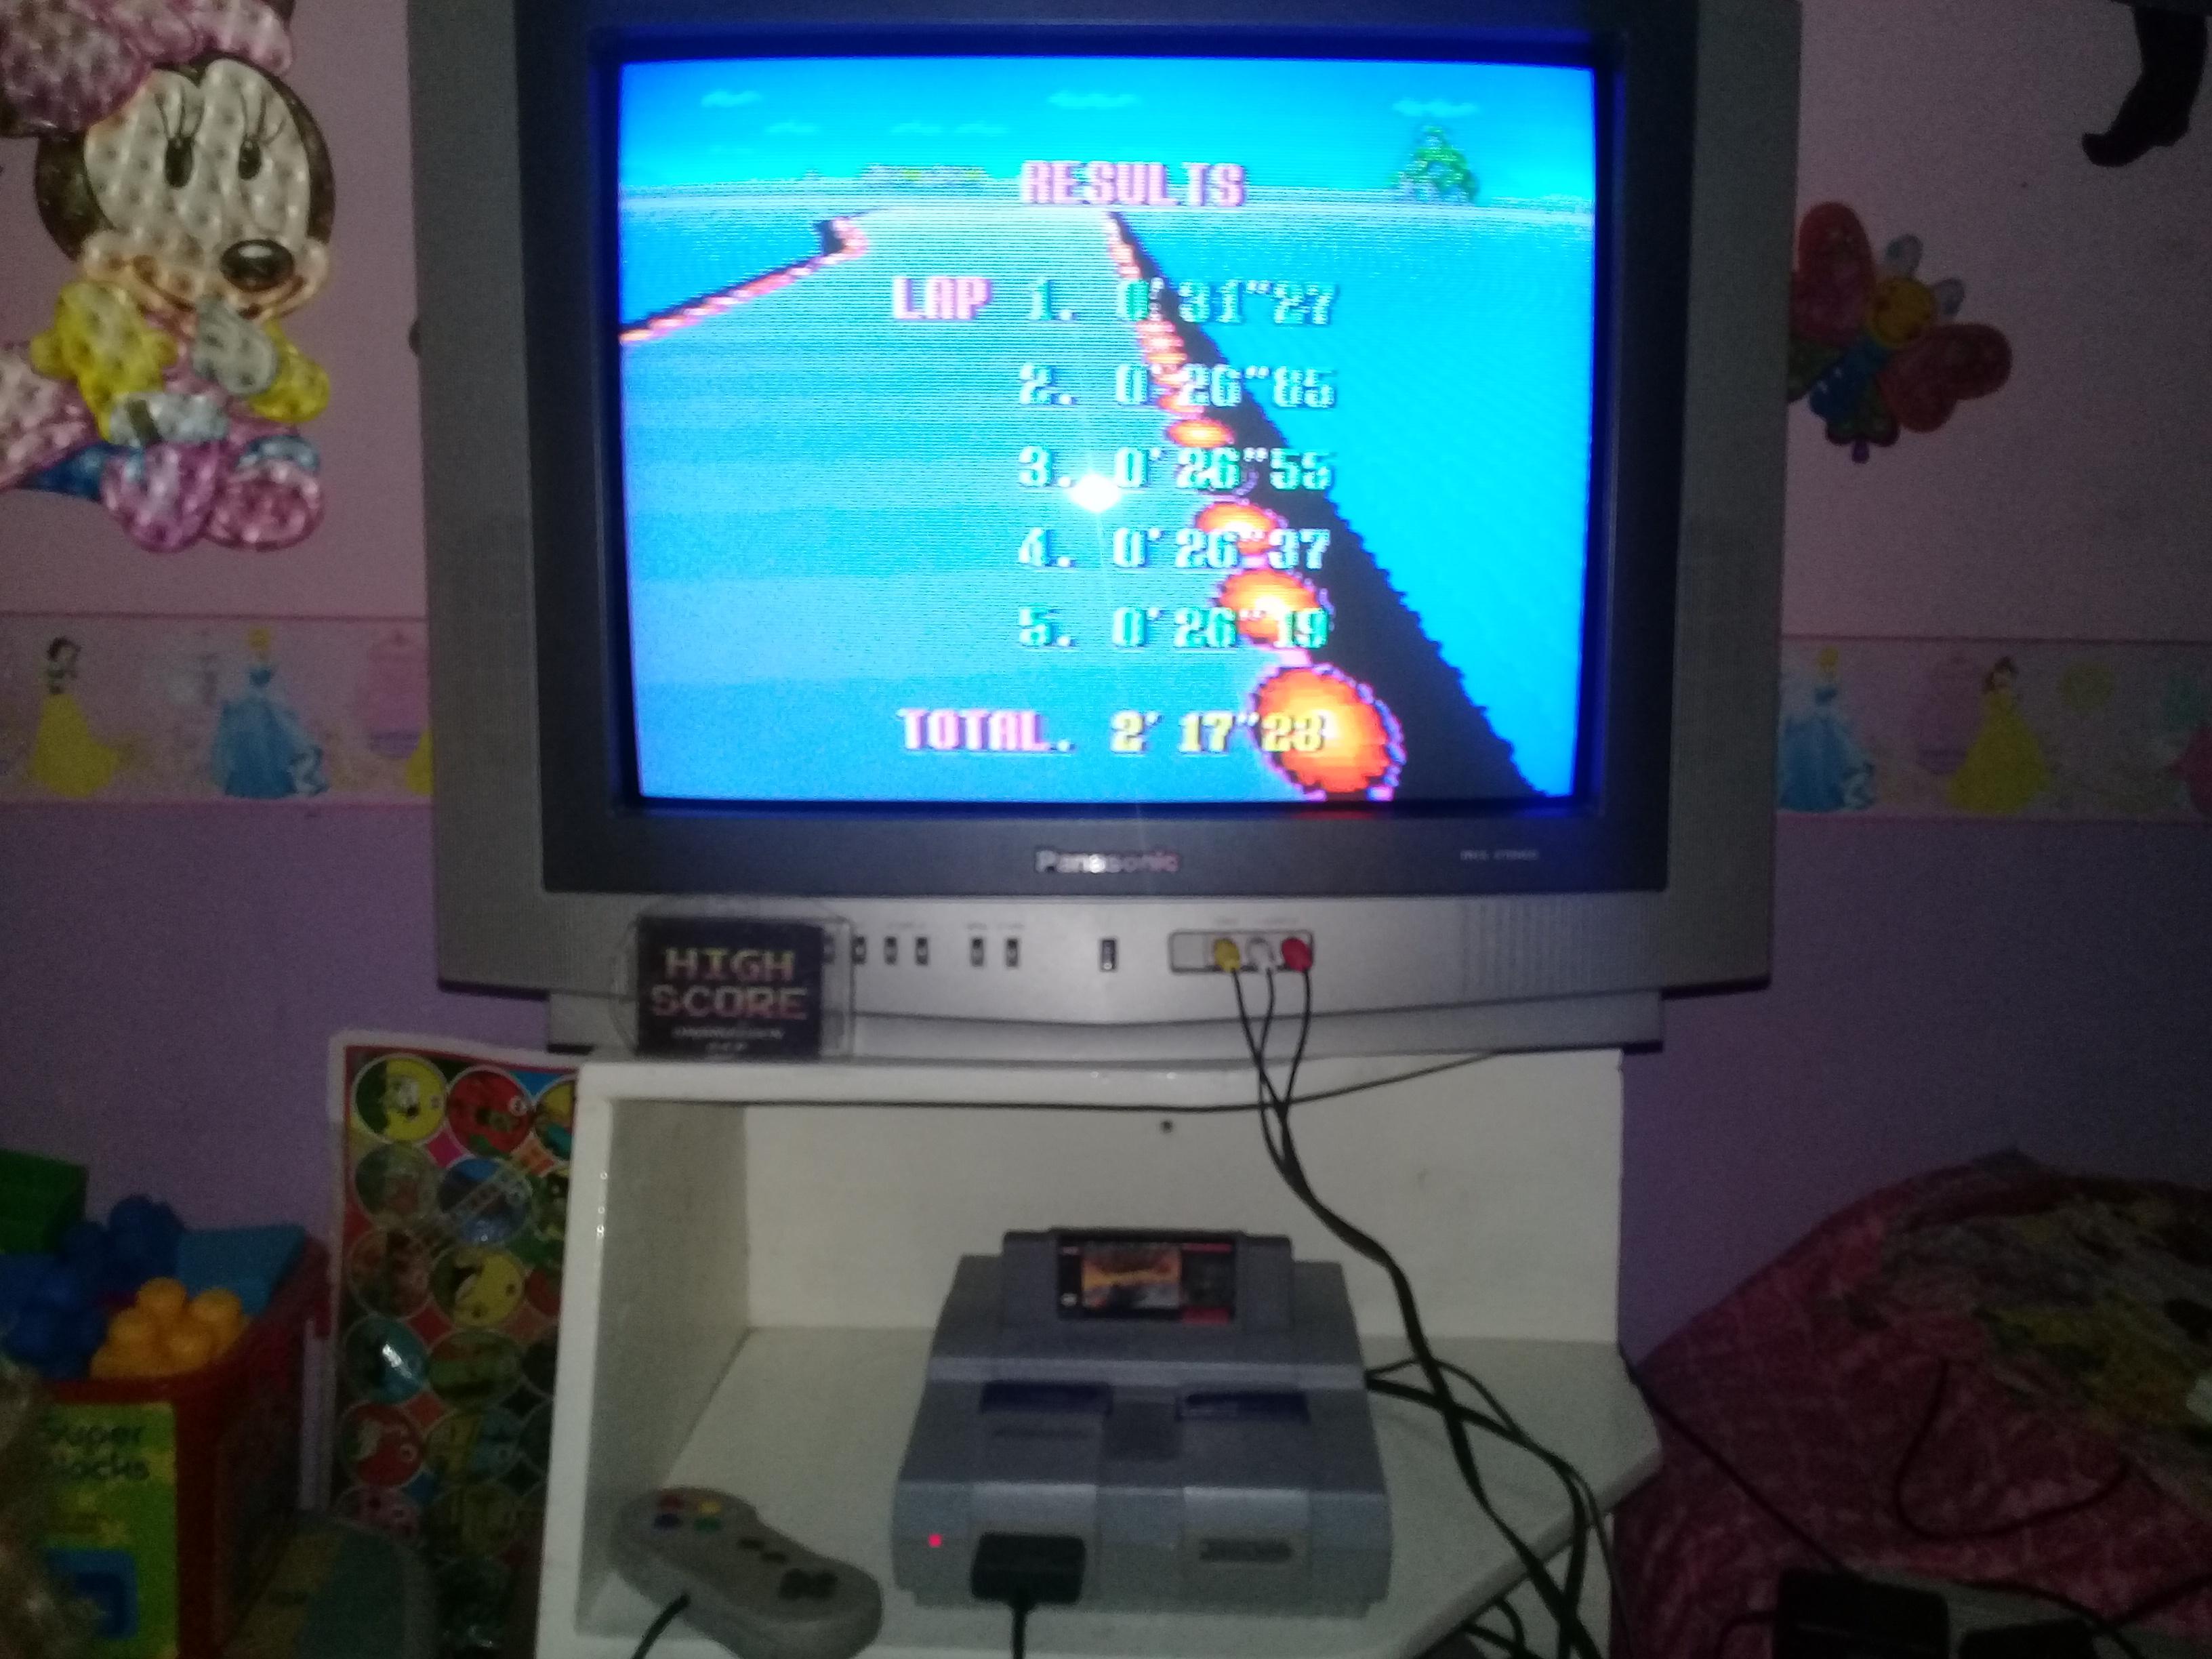 omargeddon: F-Zero: Practice [No Rival]: Big Blue (SNES/Super Famicom) 0:02:17.23 points on 2019-06-14 12:39:10